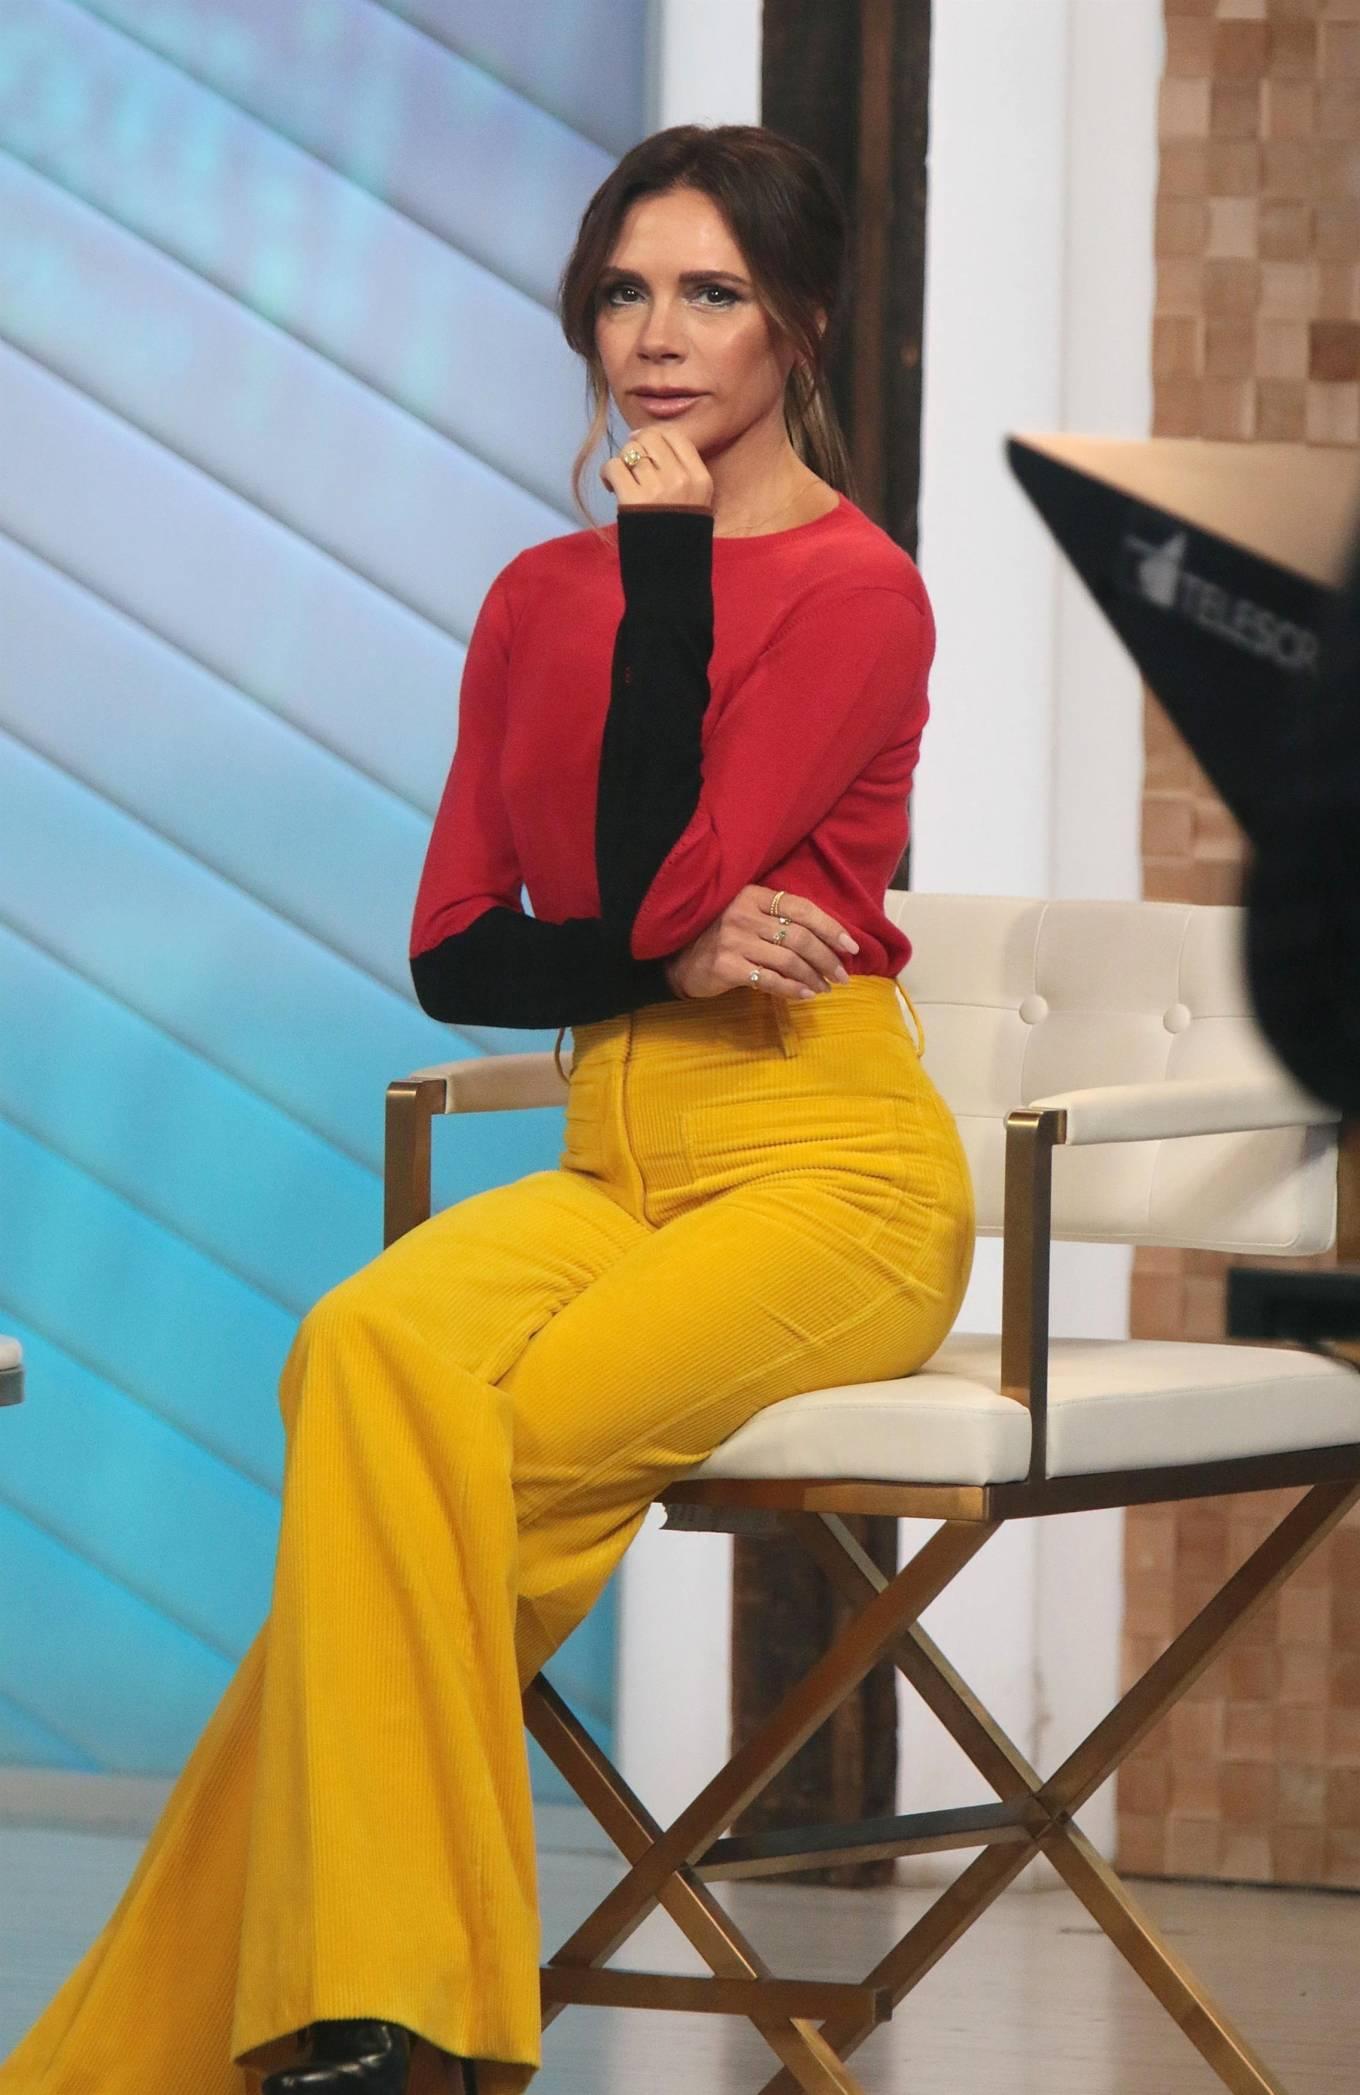 Victoria Beckham 2021 : Victoria Beckham – on Good Morning America promoting her new designer clothing in New York City-07